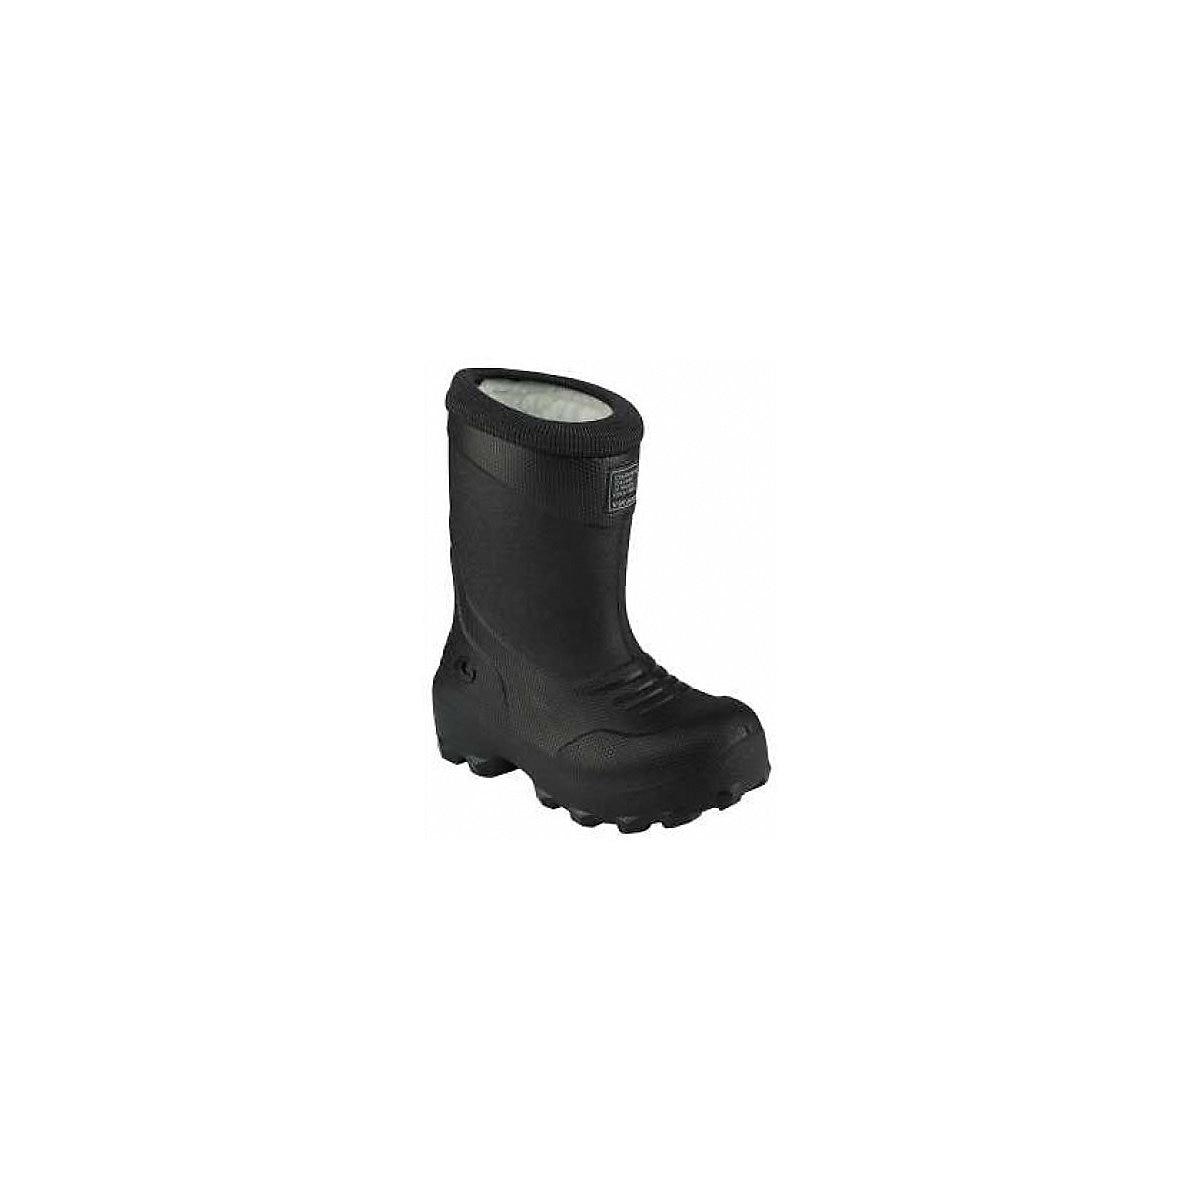 Фото - VIKING Boots 10649391 Winter Baby Boy shoes MTpromo viking boots 10649388 winter baby boy shoes